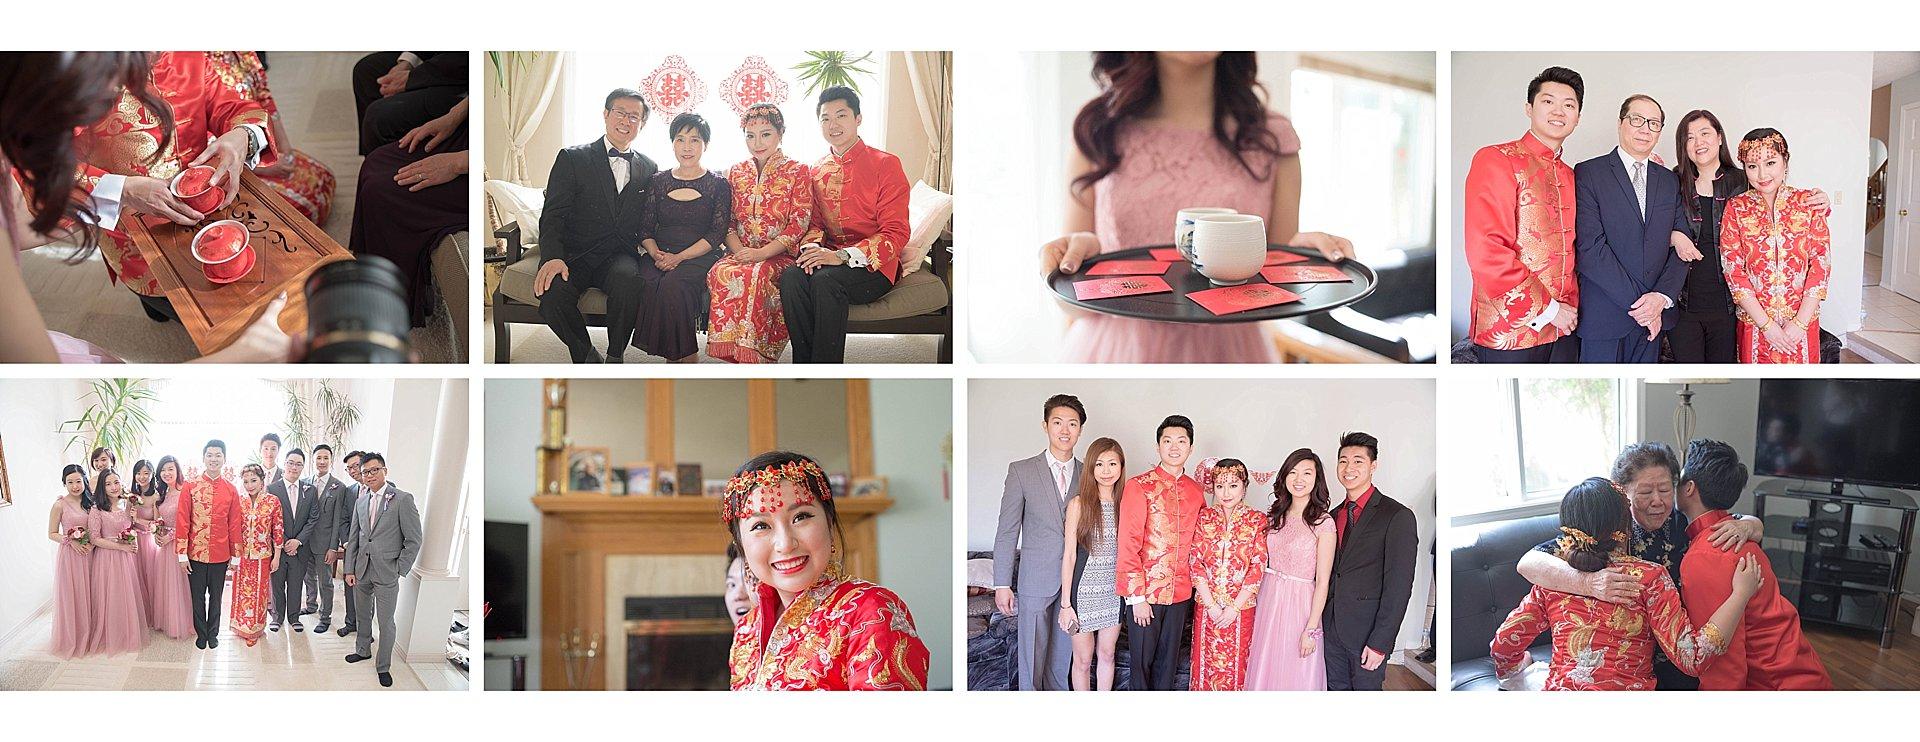 MB-First-Baptist-Church-Edmonton-Wedding-_0003